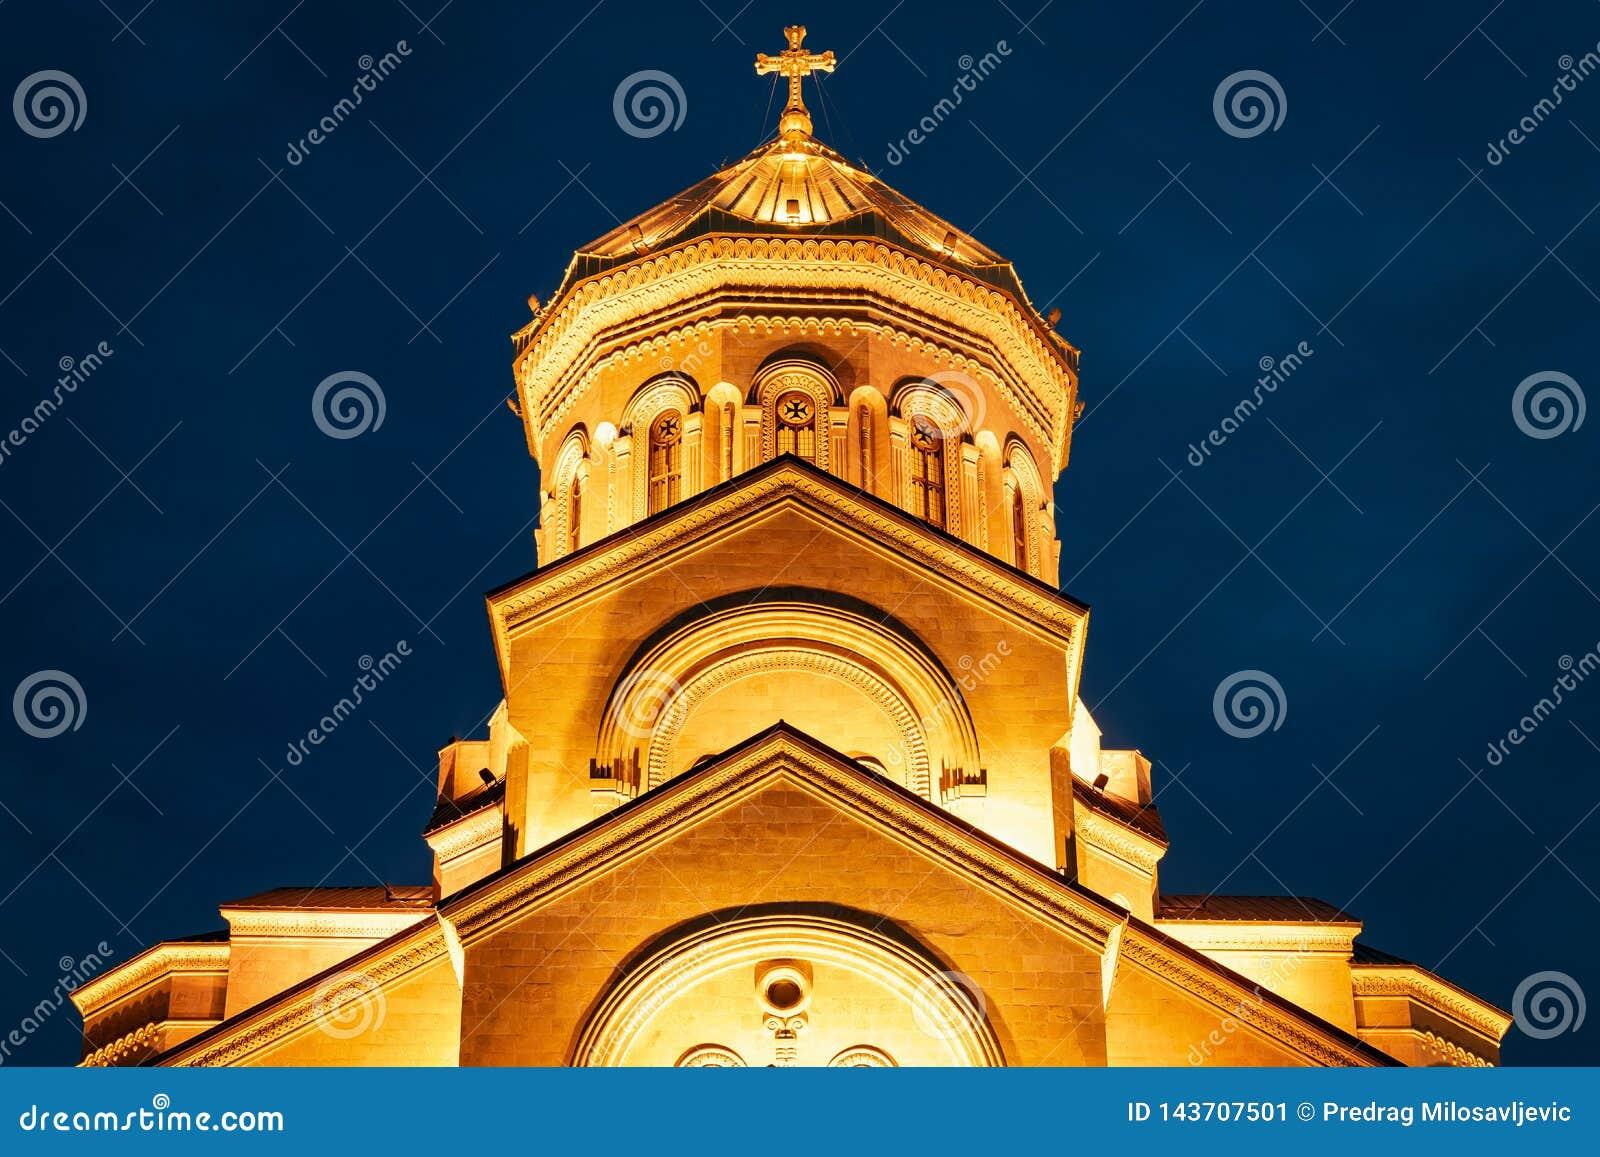 Georgia, Tbilisi - 05.02.2019. - Holy Trinity Sameba othodox cathedral. Night view - closeup